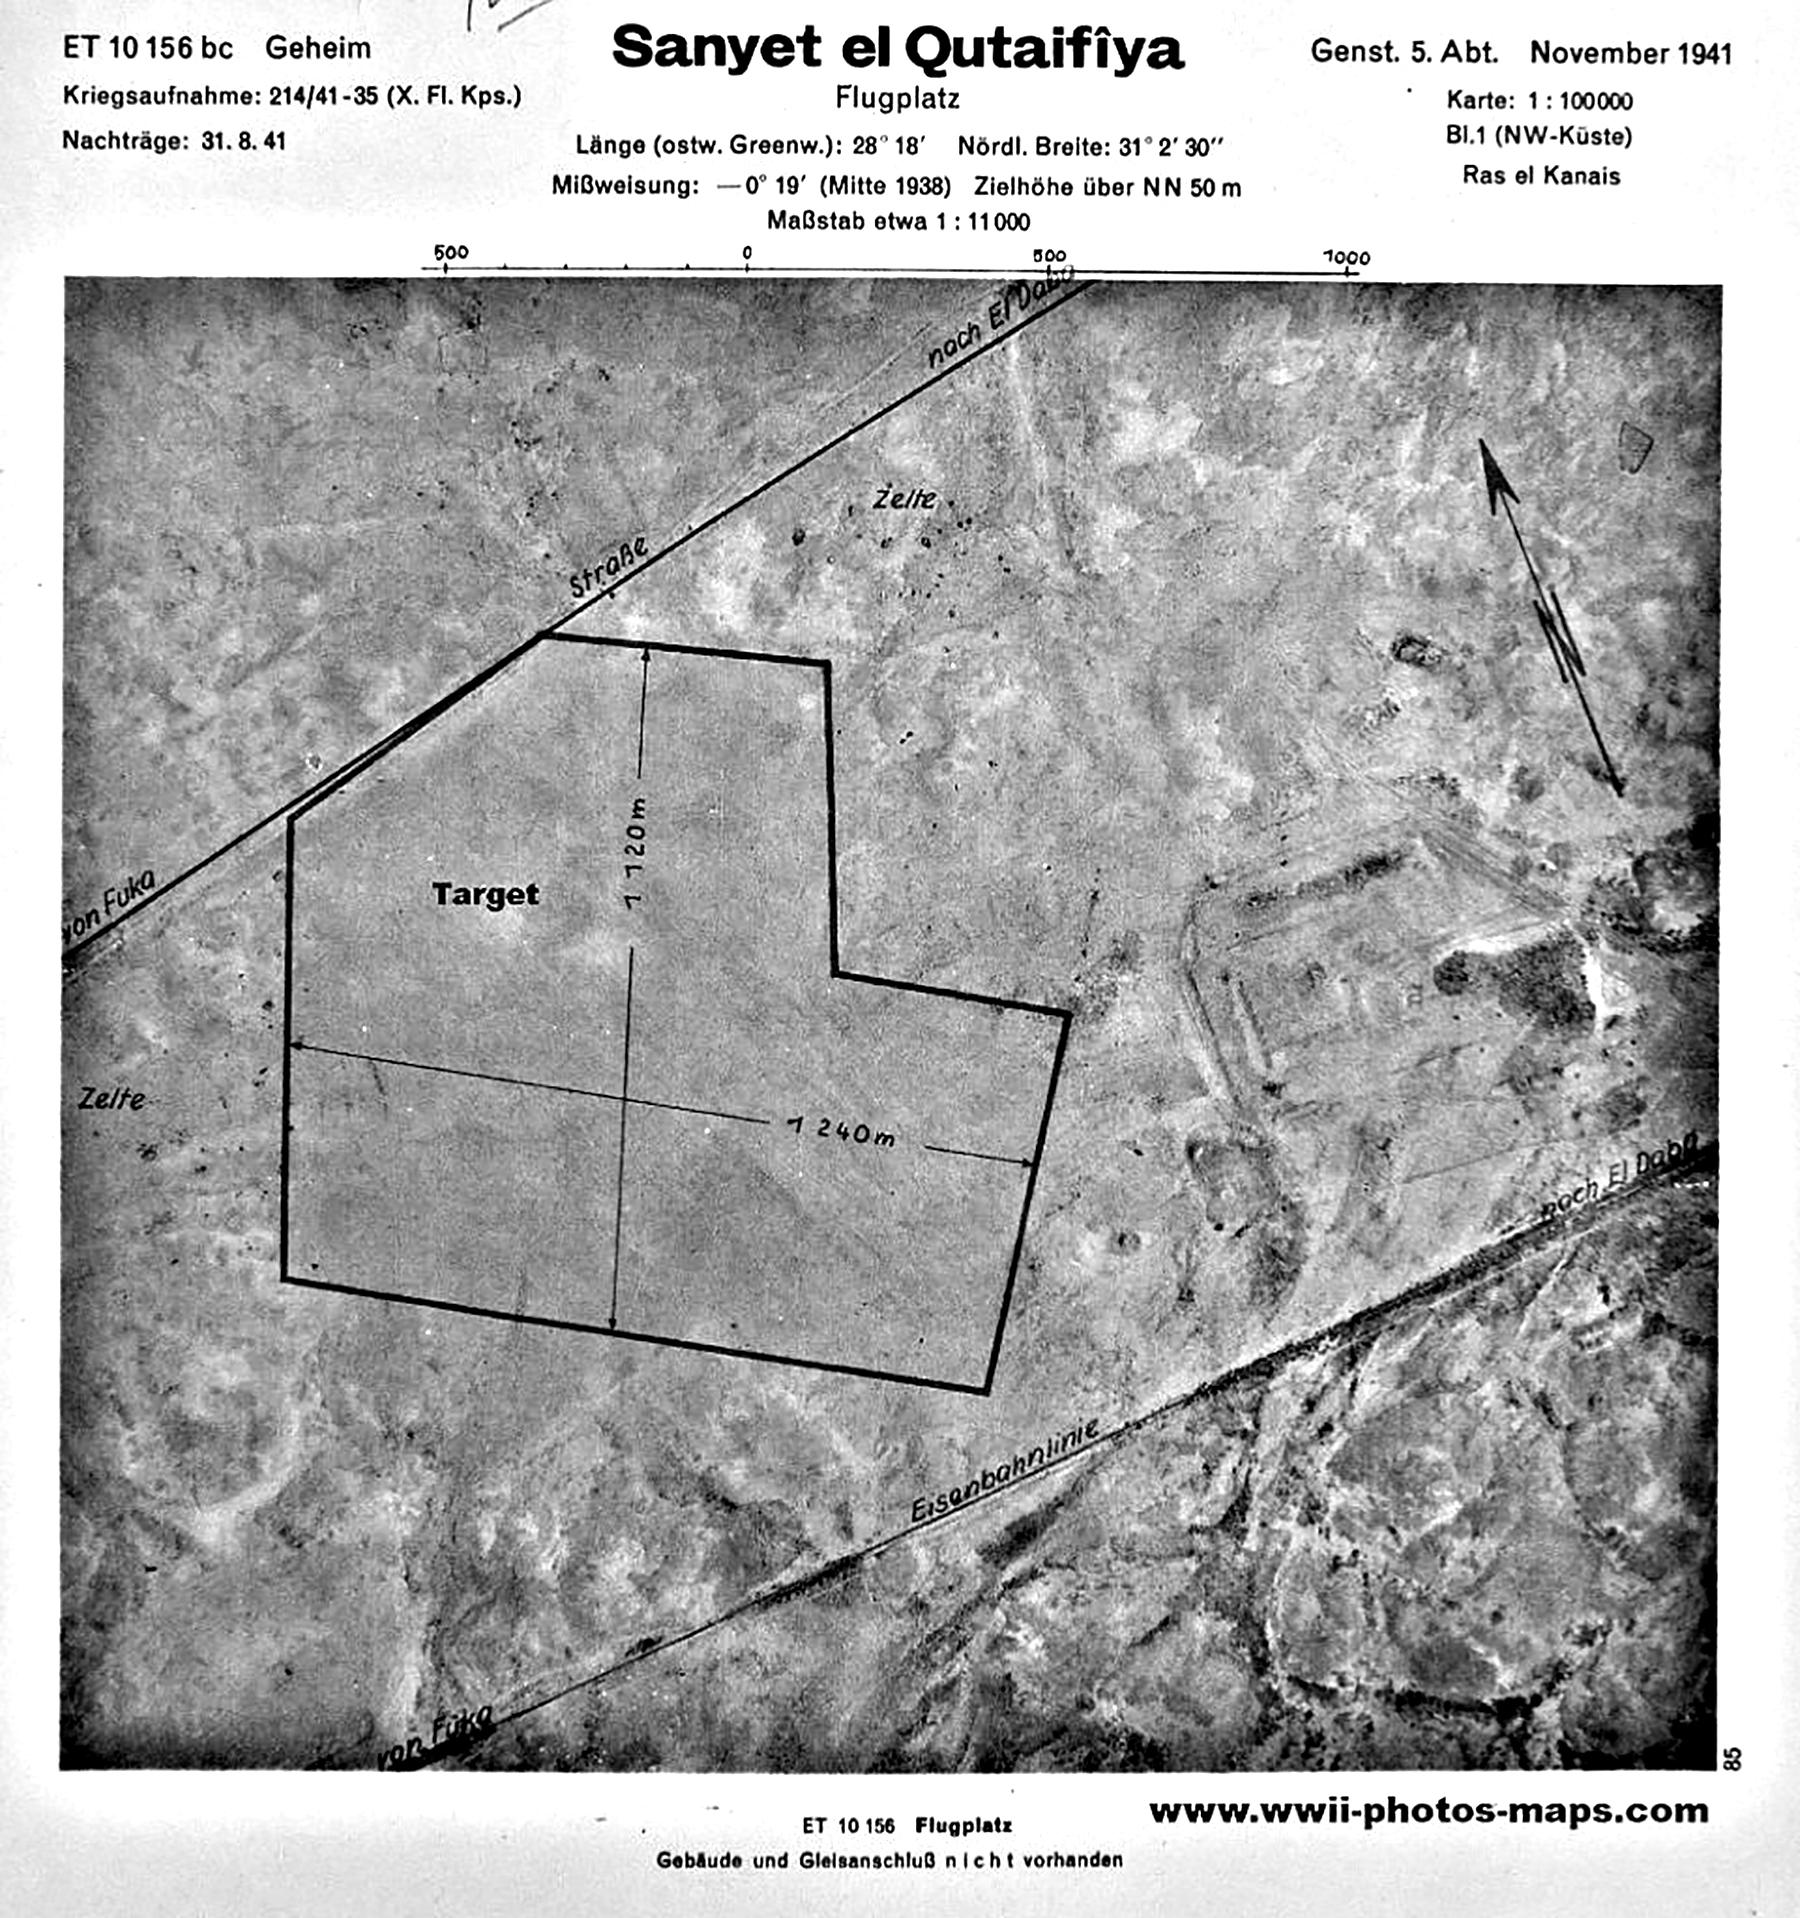 Aerial photo showing WWII aerodrome at Sanyet el Qutaifiya Flugplatz 1941 01